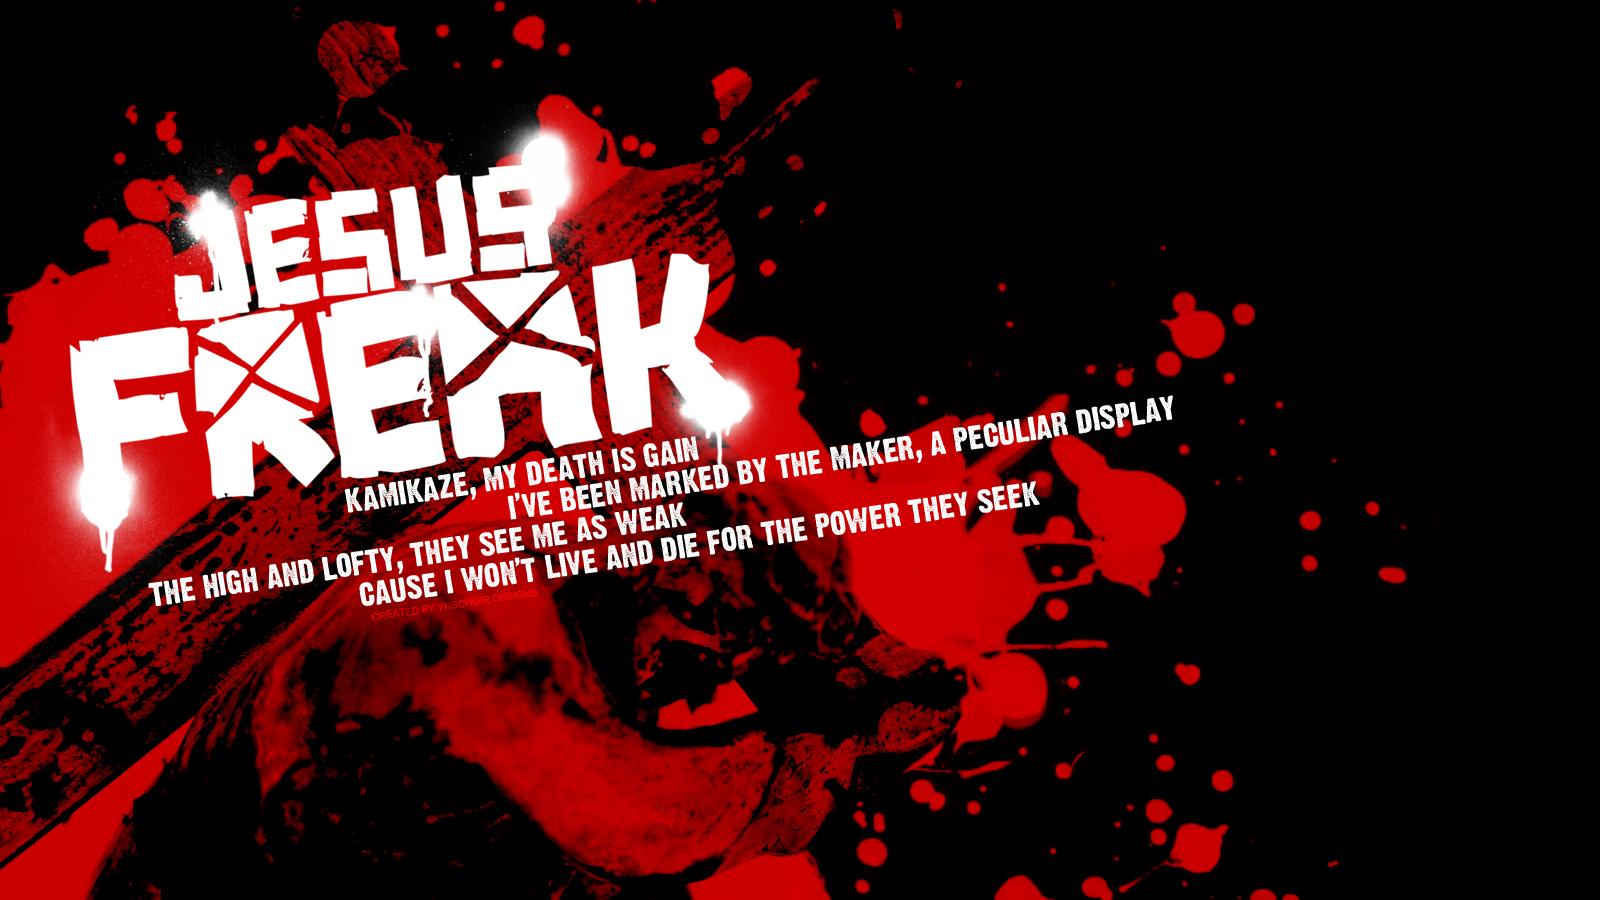 Christian Graphic: Jesus Freak Black And Red Papel de Parede Imagem